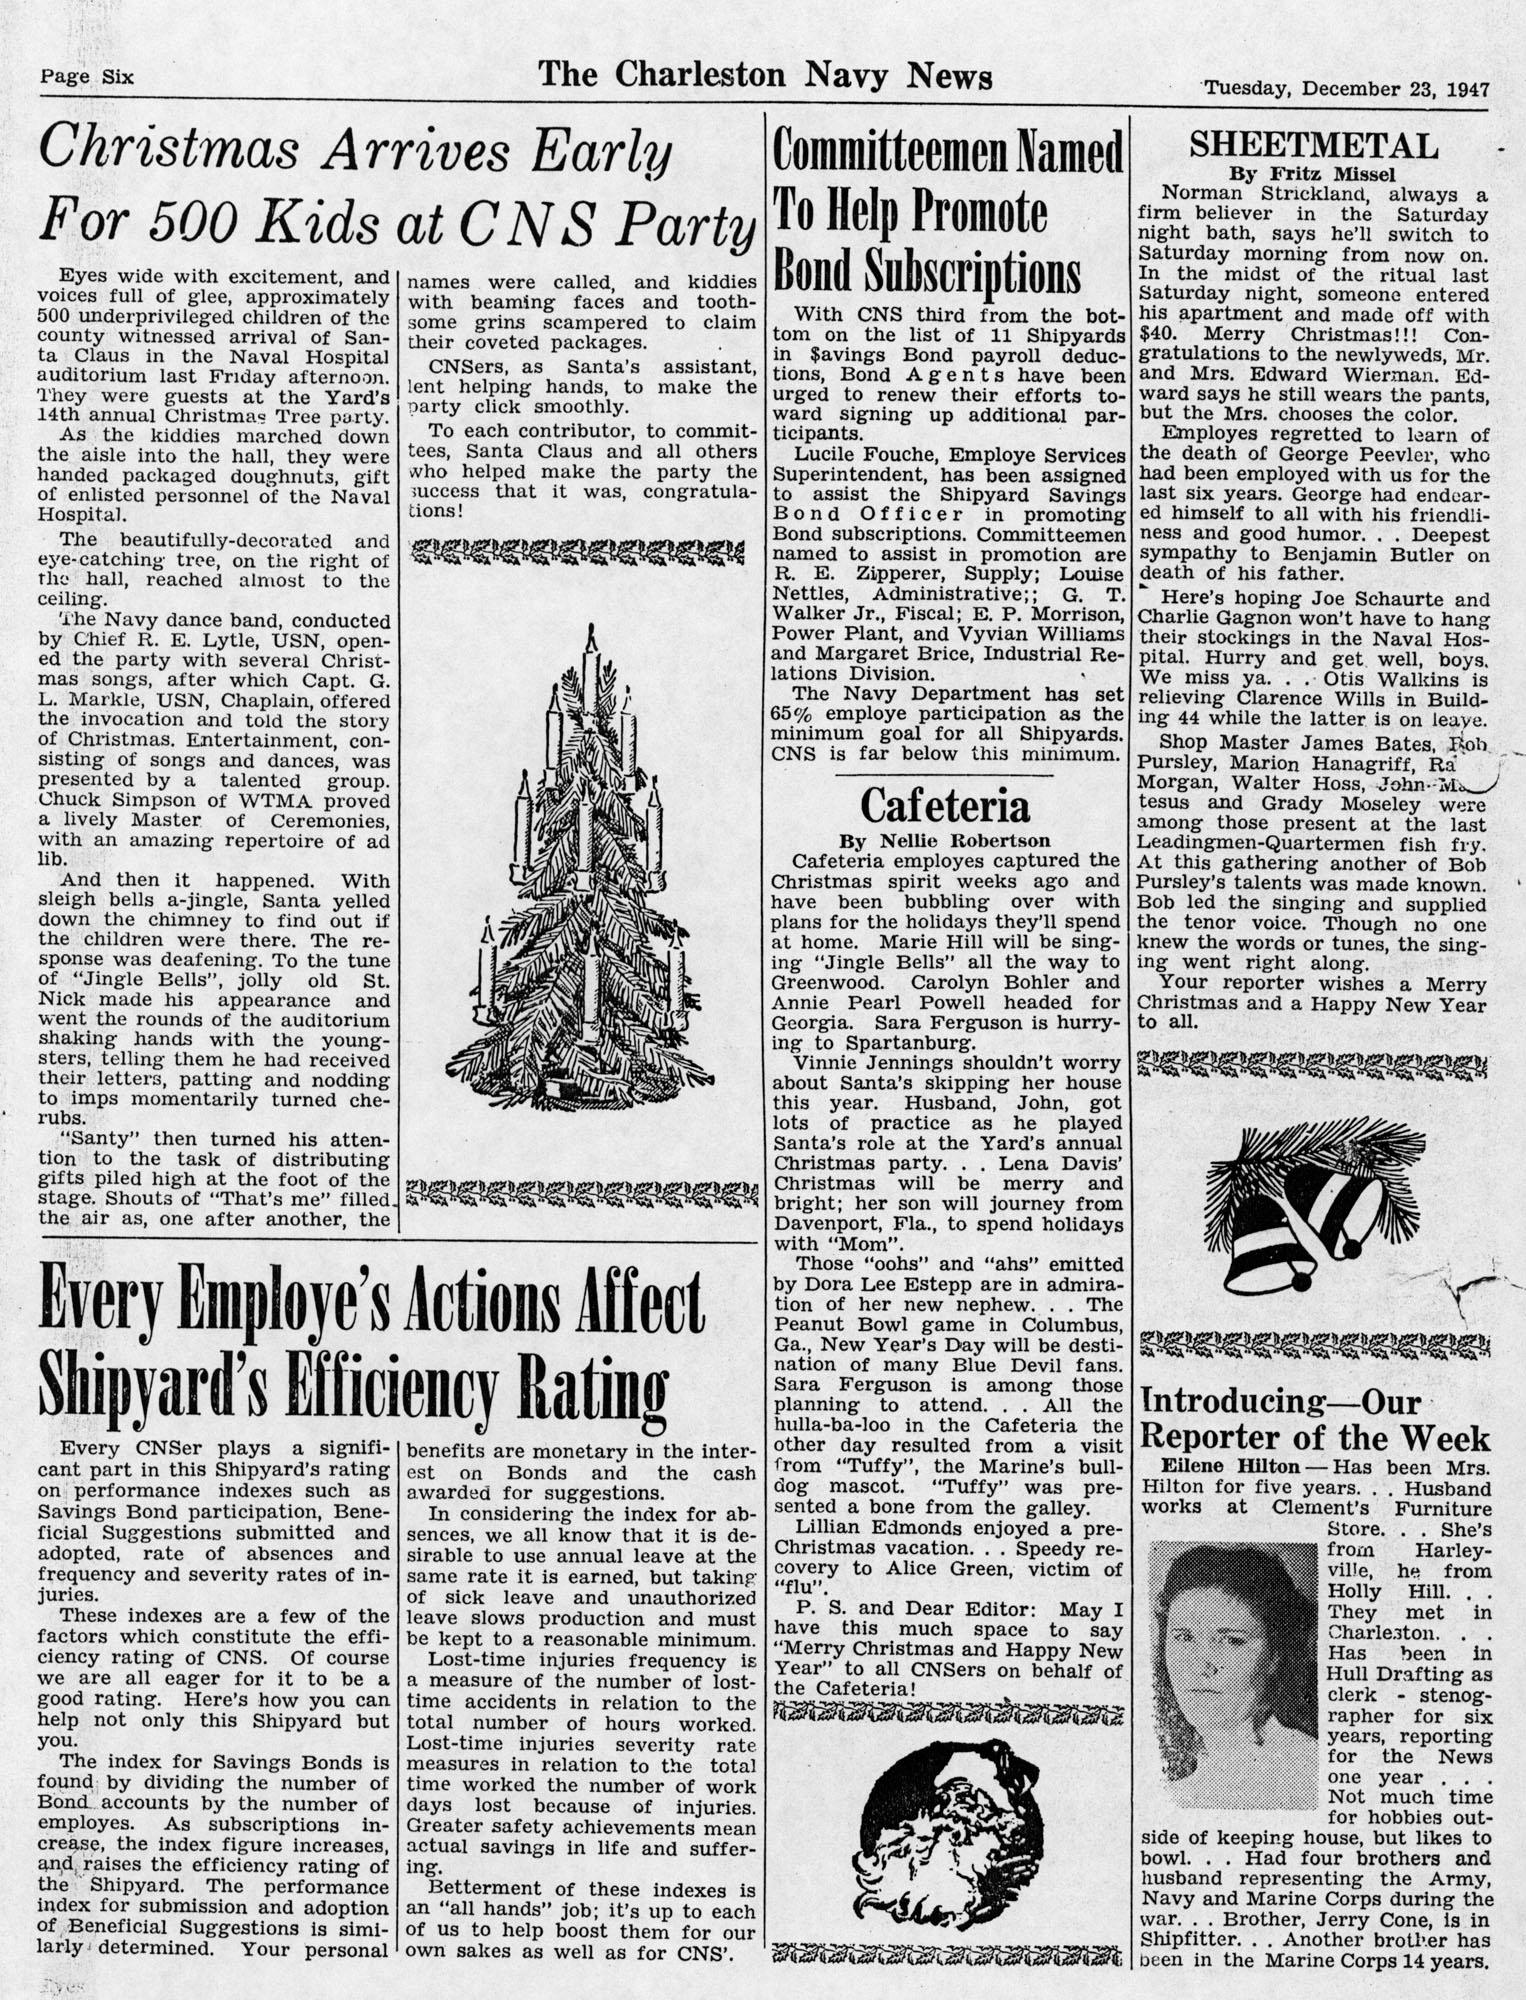 The Charleston Navy News, Volume 6, Edition 11, page vi